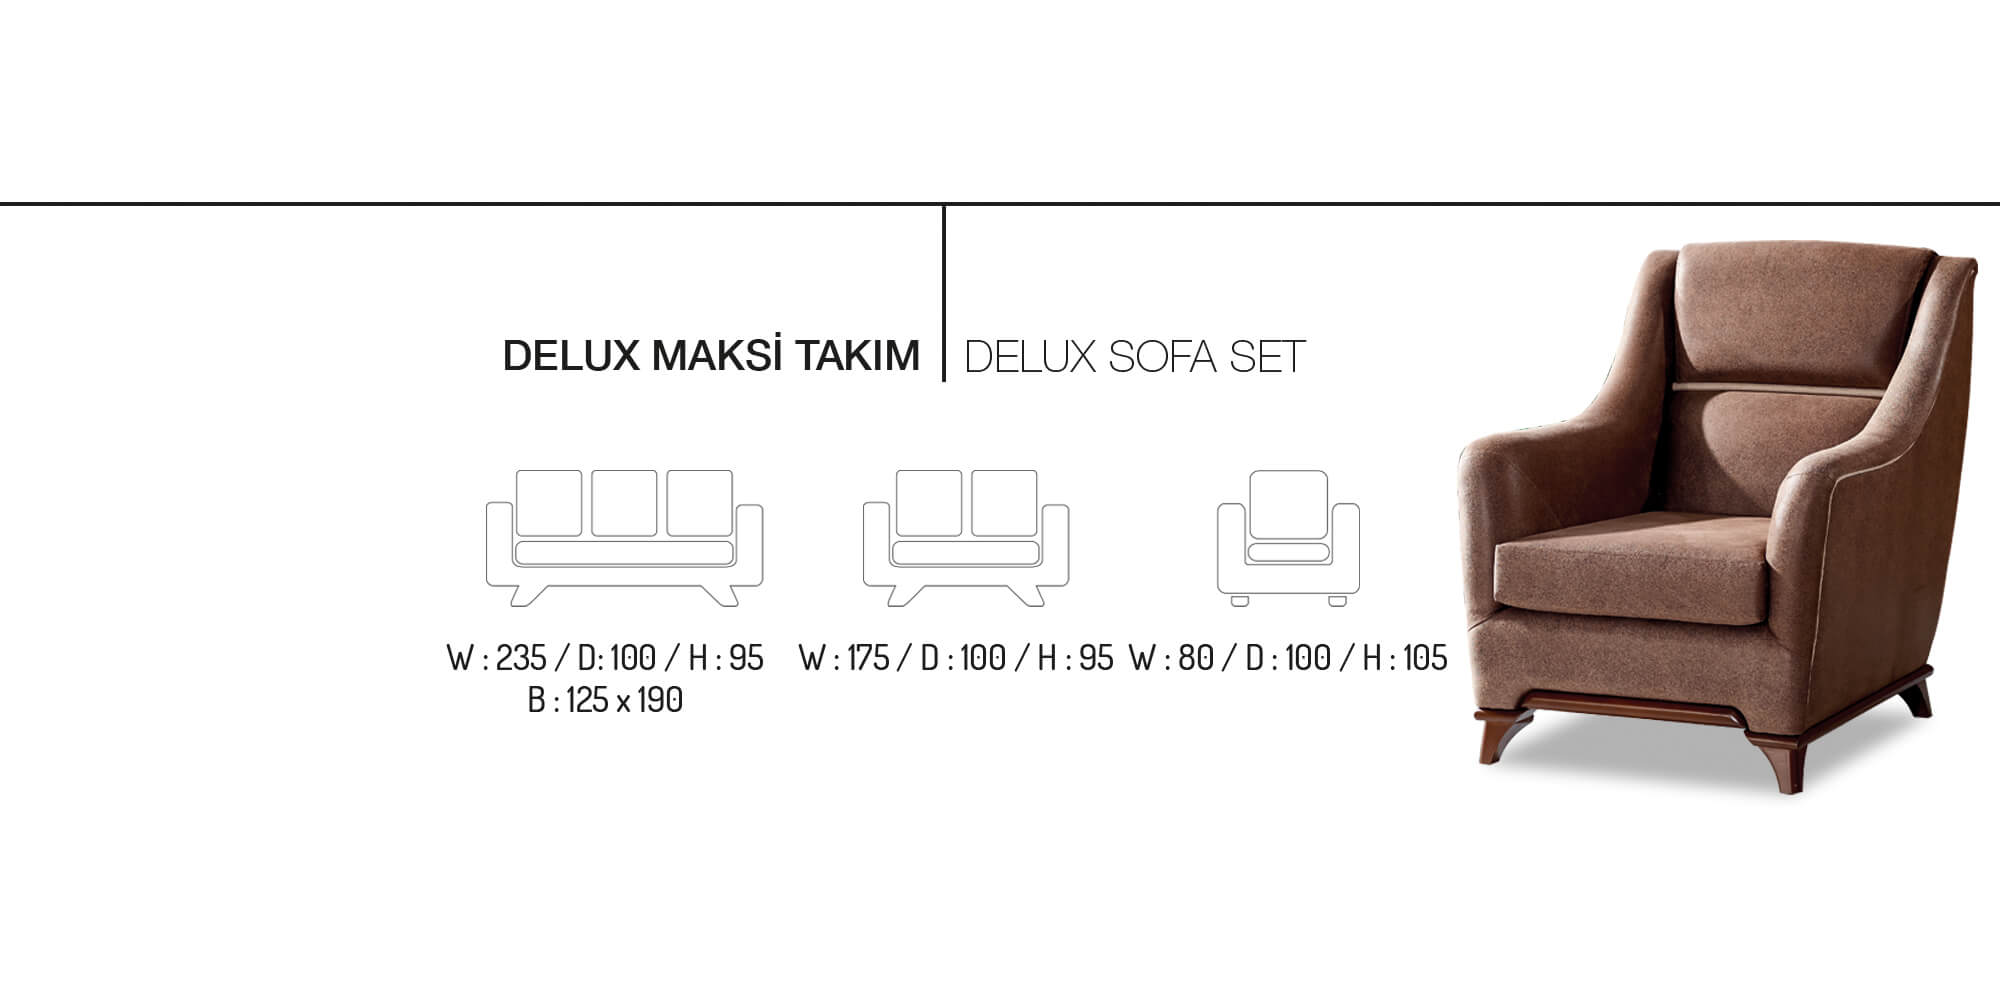 loft-deluxe-sofa-set-4